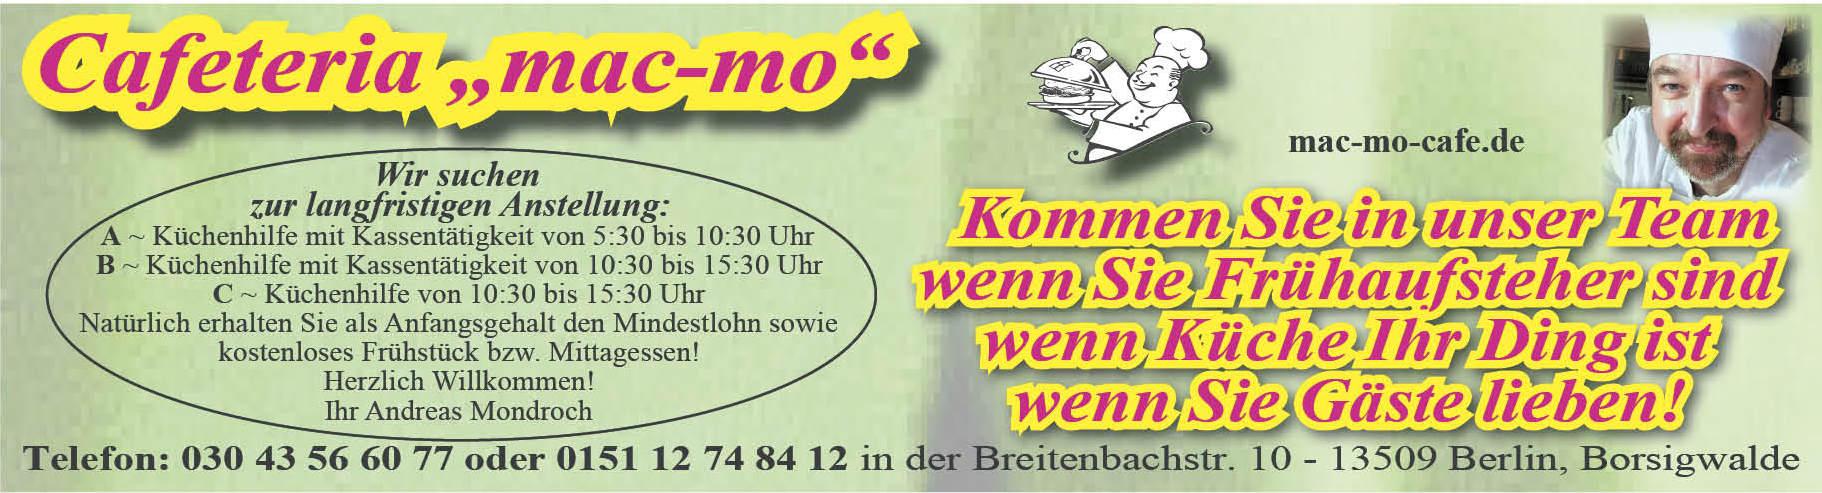 136 wp 08 Cafeteria mac-mo Mitarb